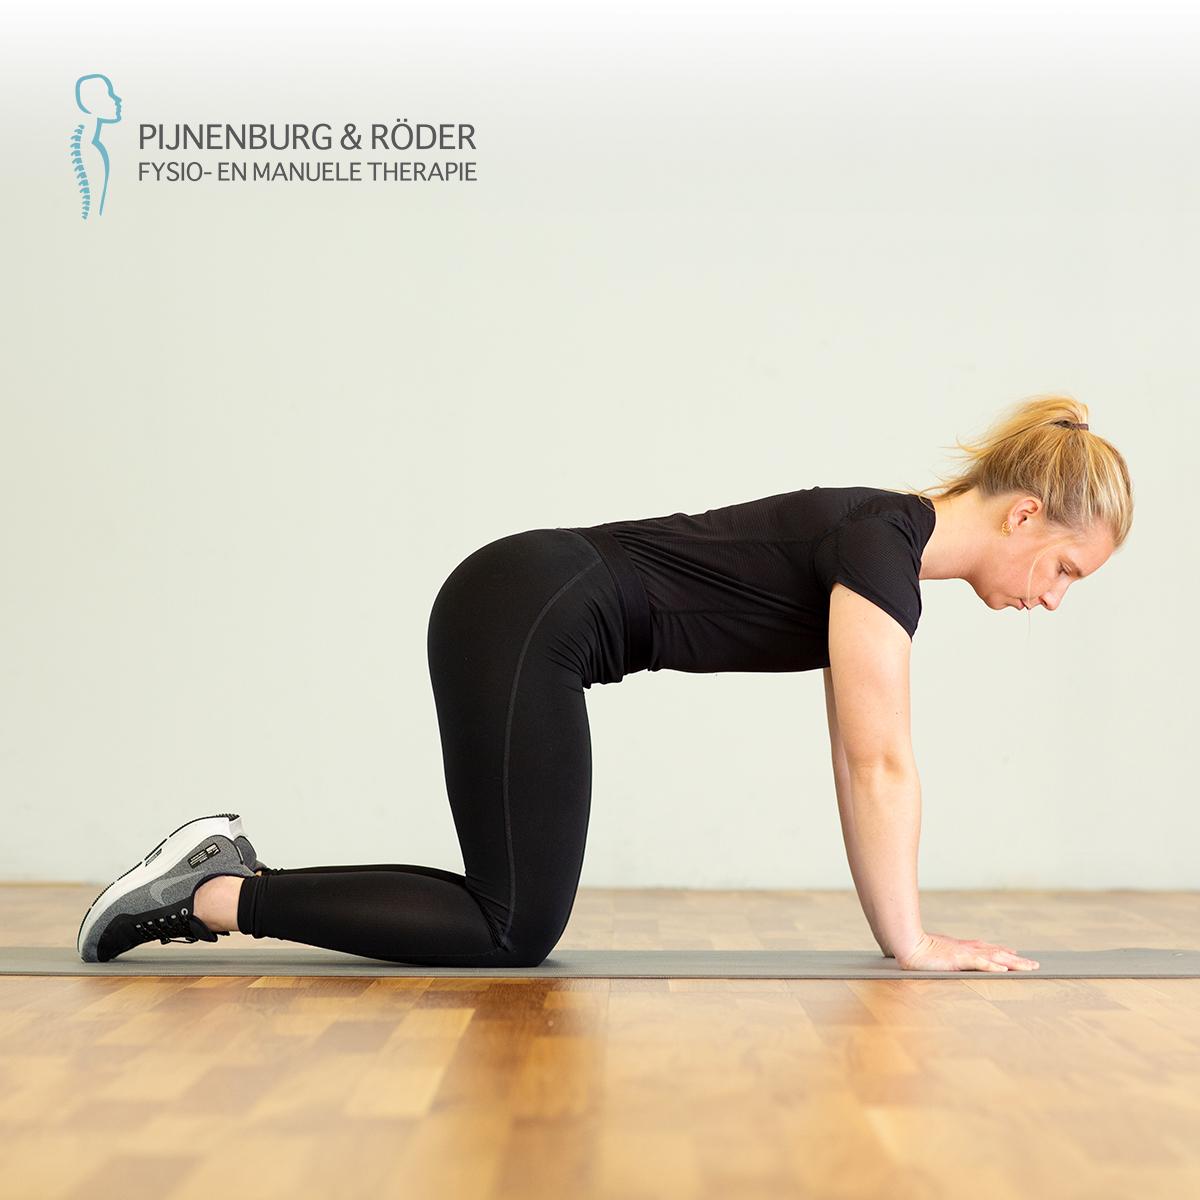 Lage rug mobiliteit kruiphouding